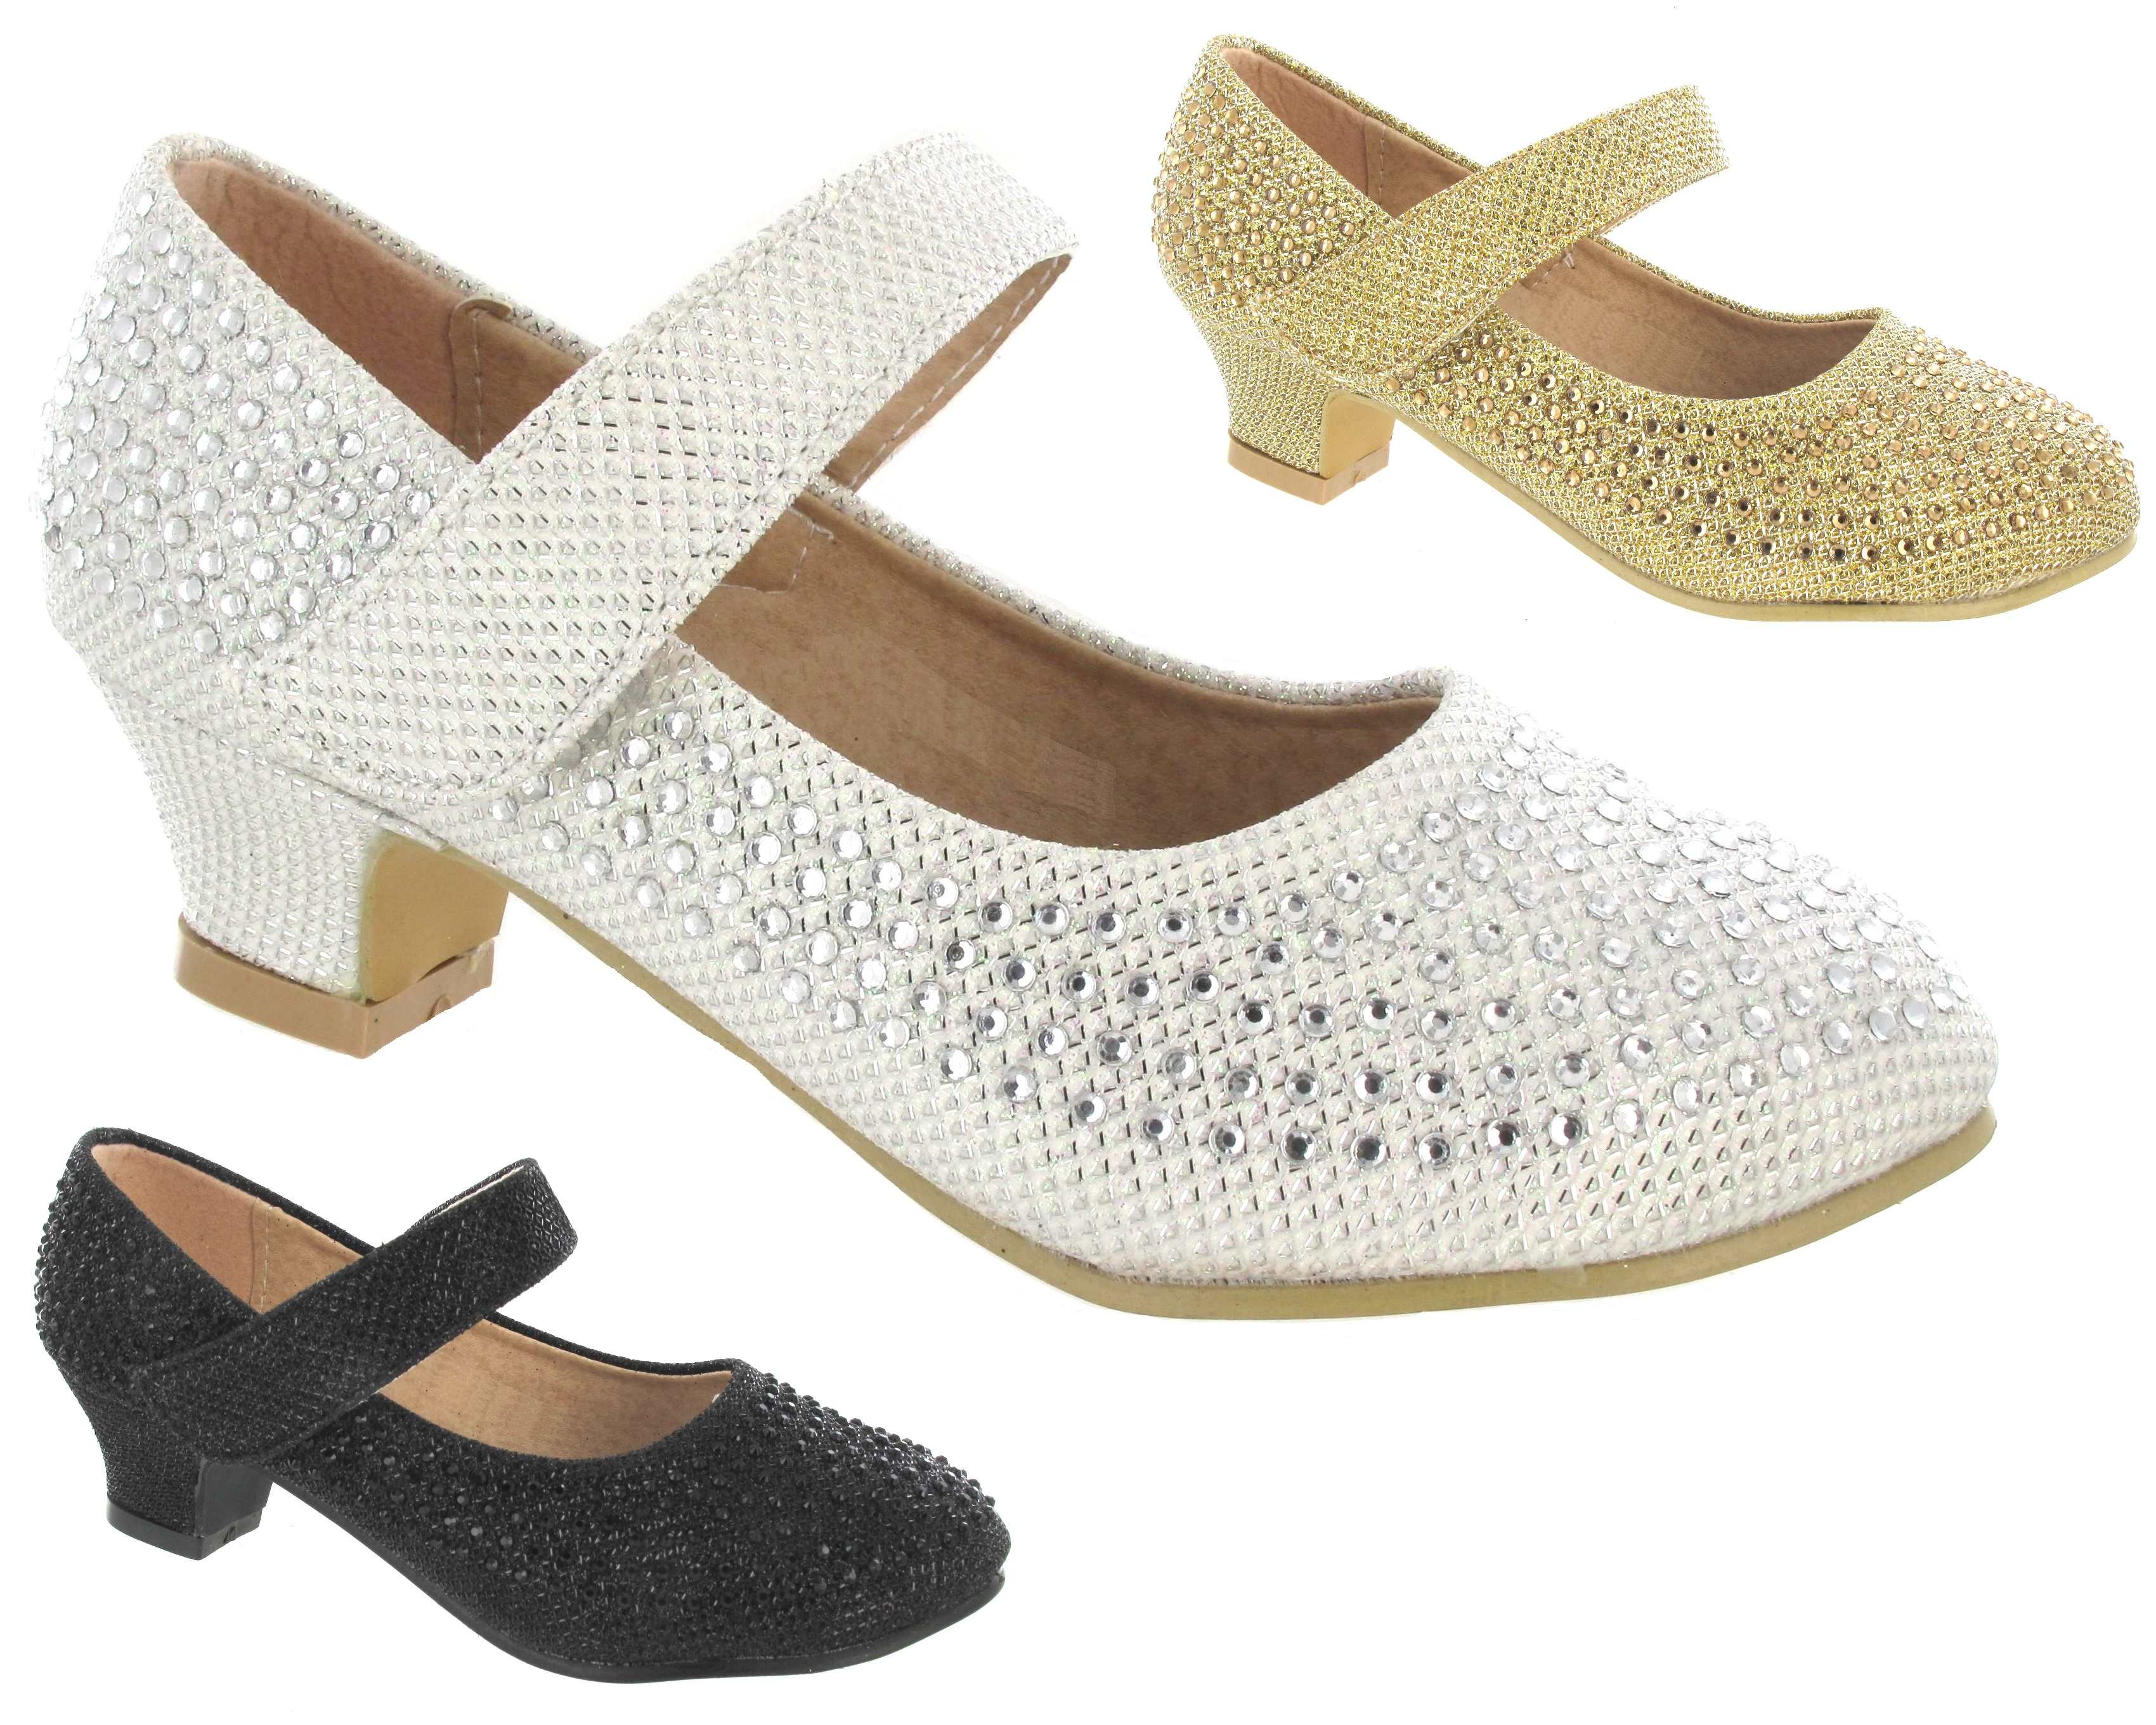 Clarks Shoes Burnley